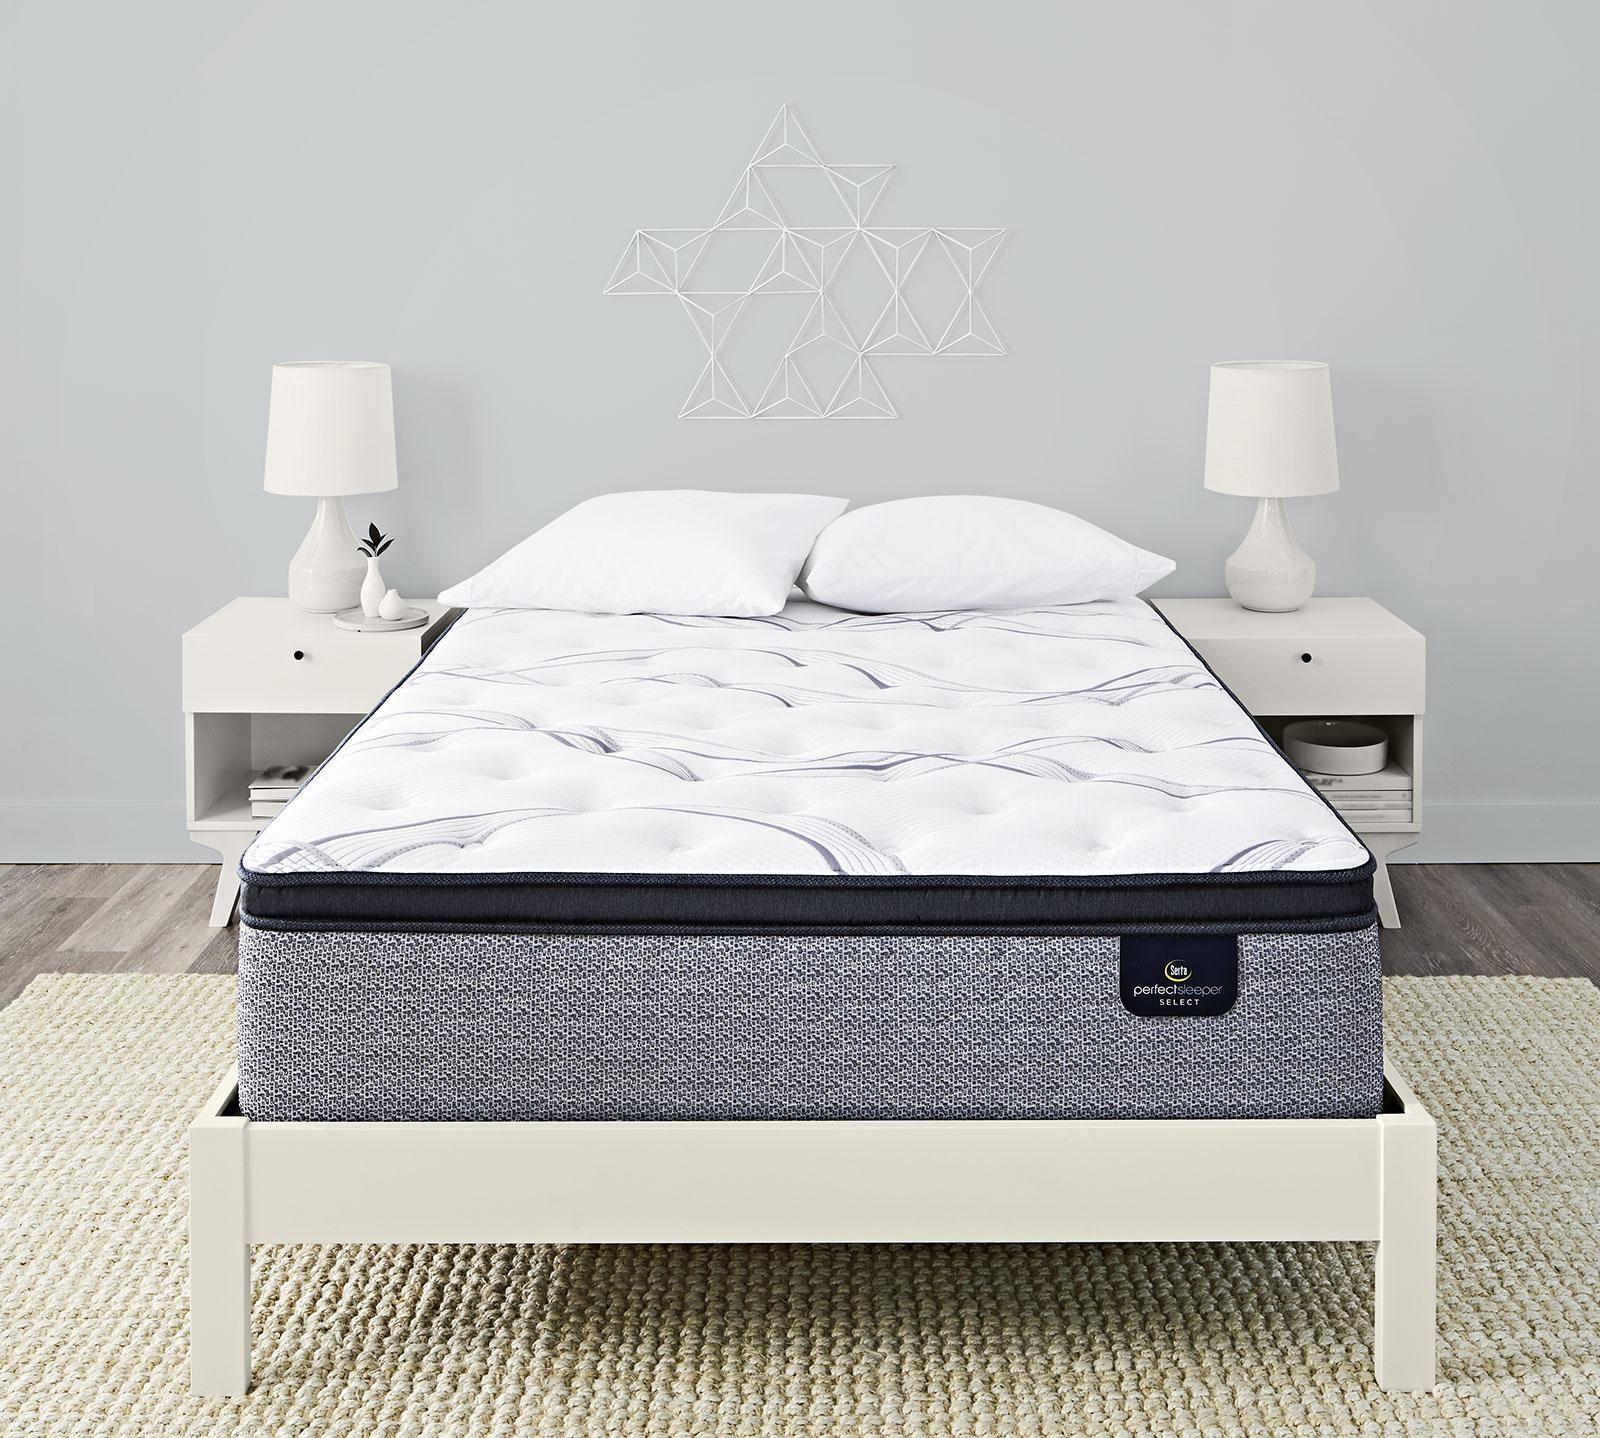 Serta Perfect Sleeper Elite Trelleburg II 14.25 Plush Pillow Top Mattress